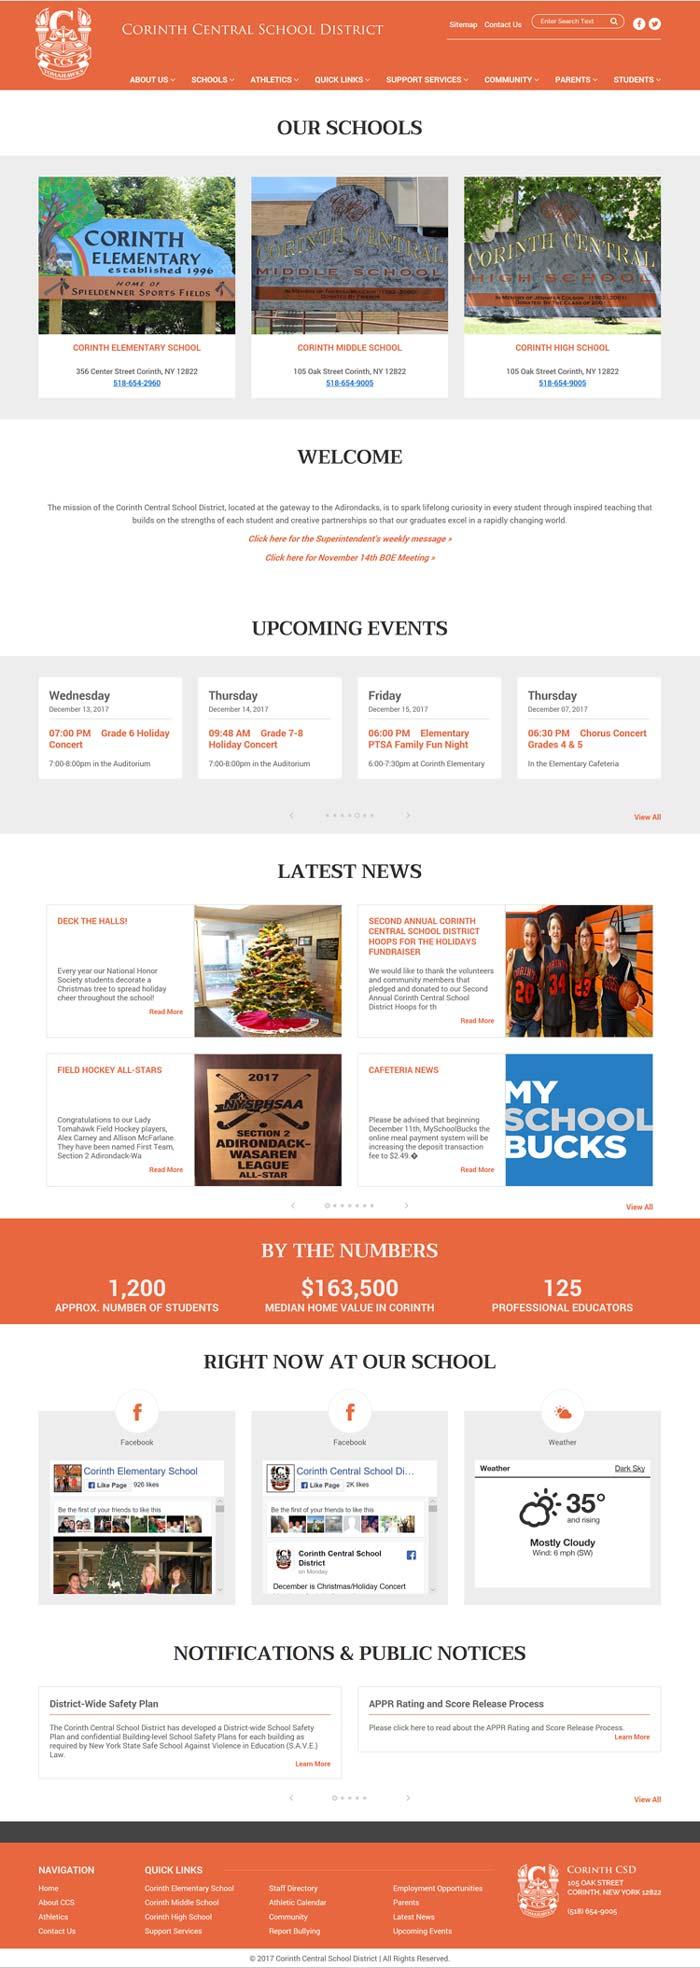 CCSD website